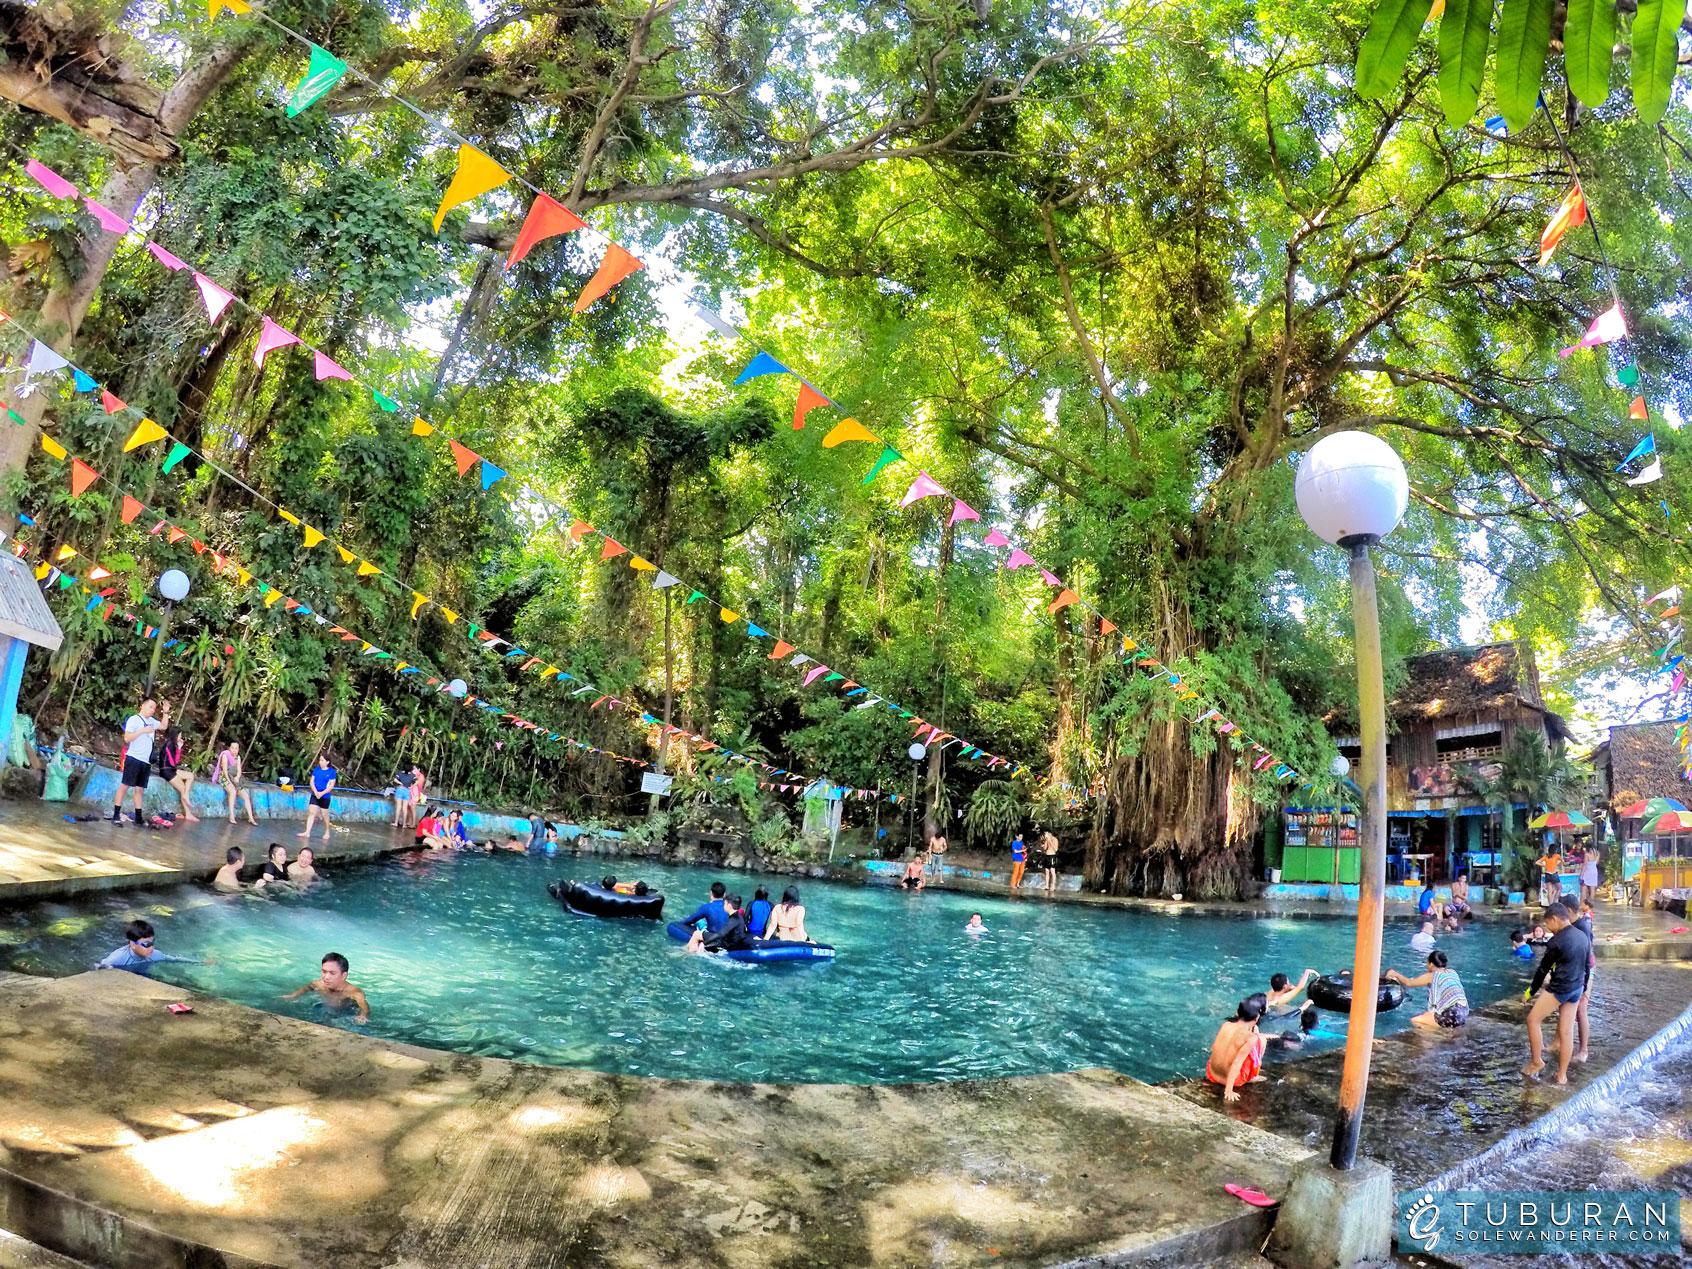 Summer Travel To Tabuelan And Tuburan Cebu On A Shoestring